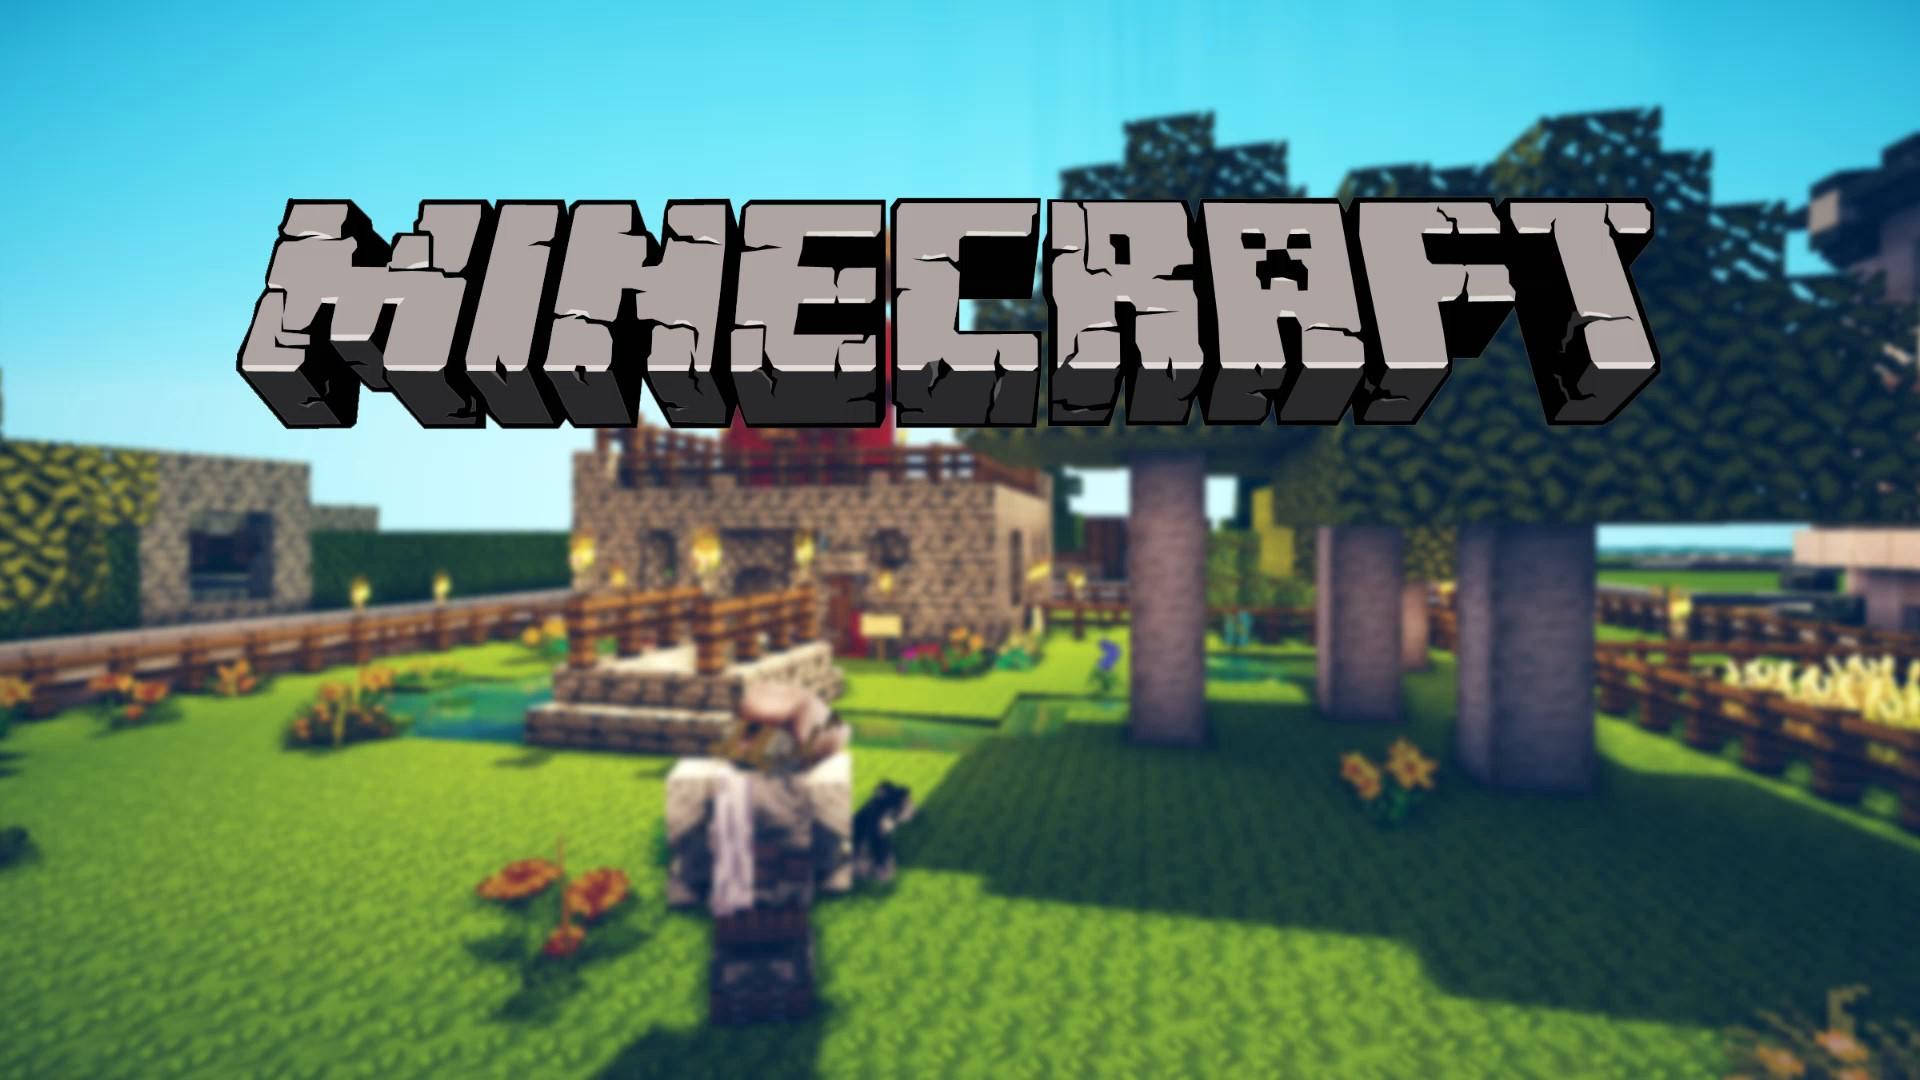 Simple Wallpaper Minecraft Poster - minecraft_wallpaper_by_kretas95-d724qa8  Graphic_527293.jpg